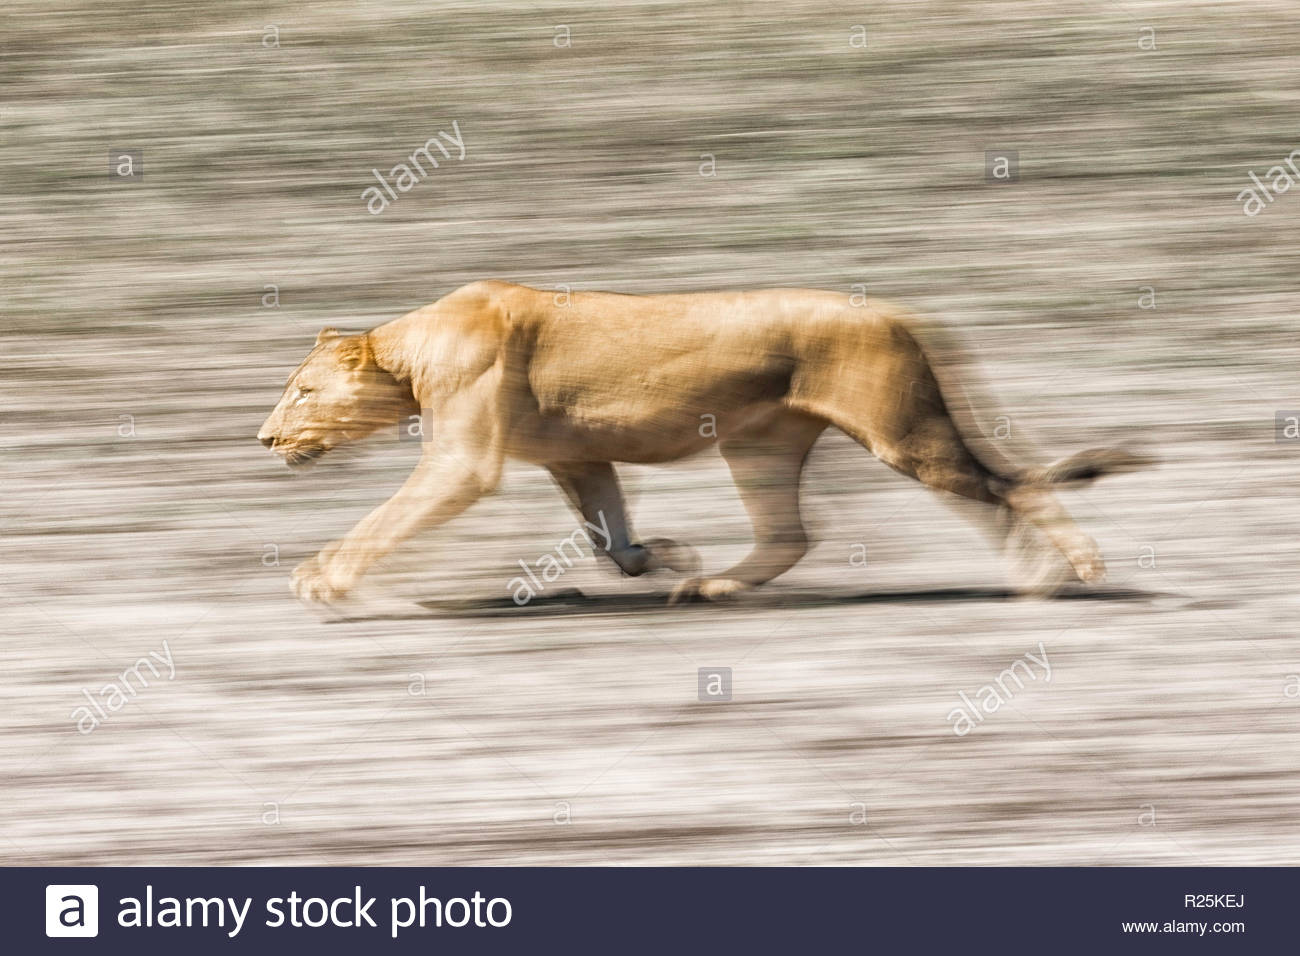 Lion (Pathera leo), Edge of Chobe River, Botswana, Africa Stock Photo